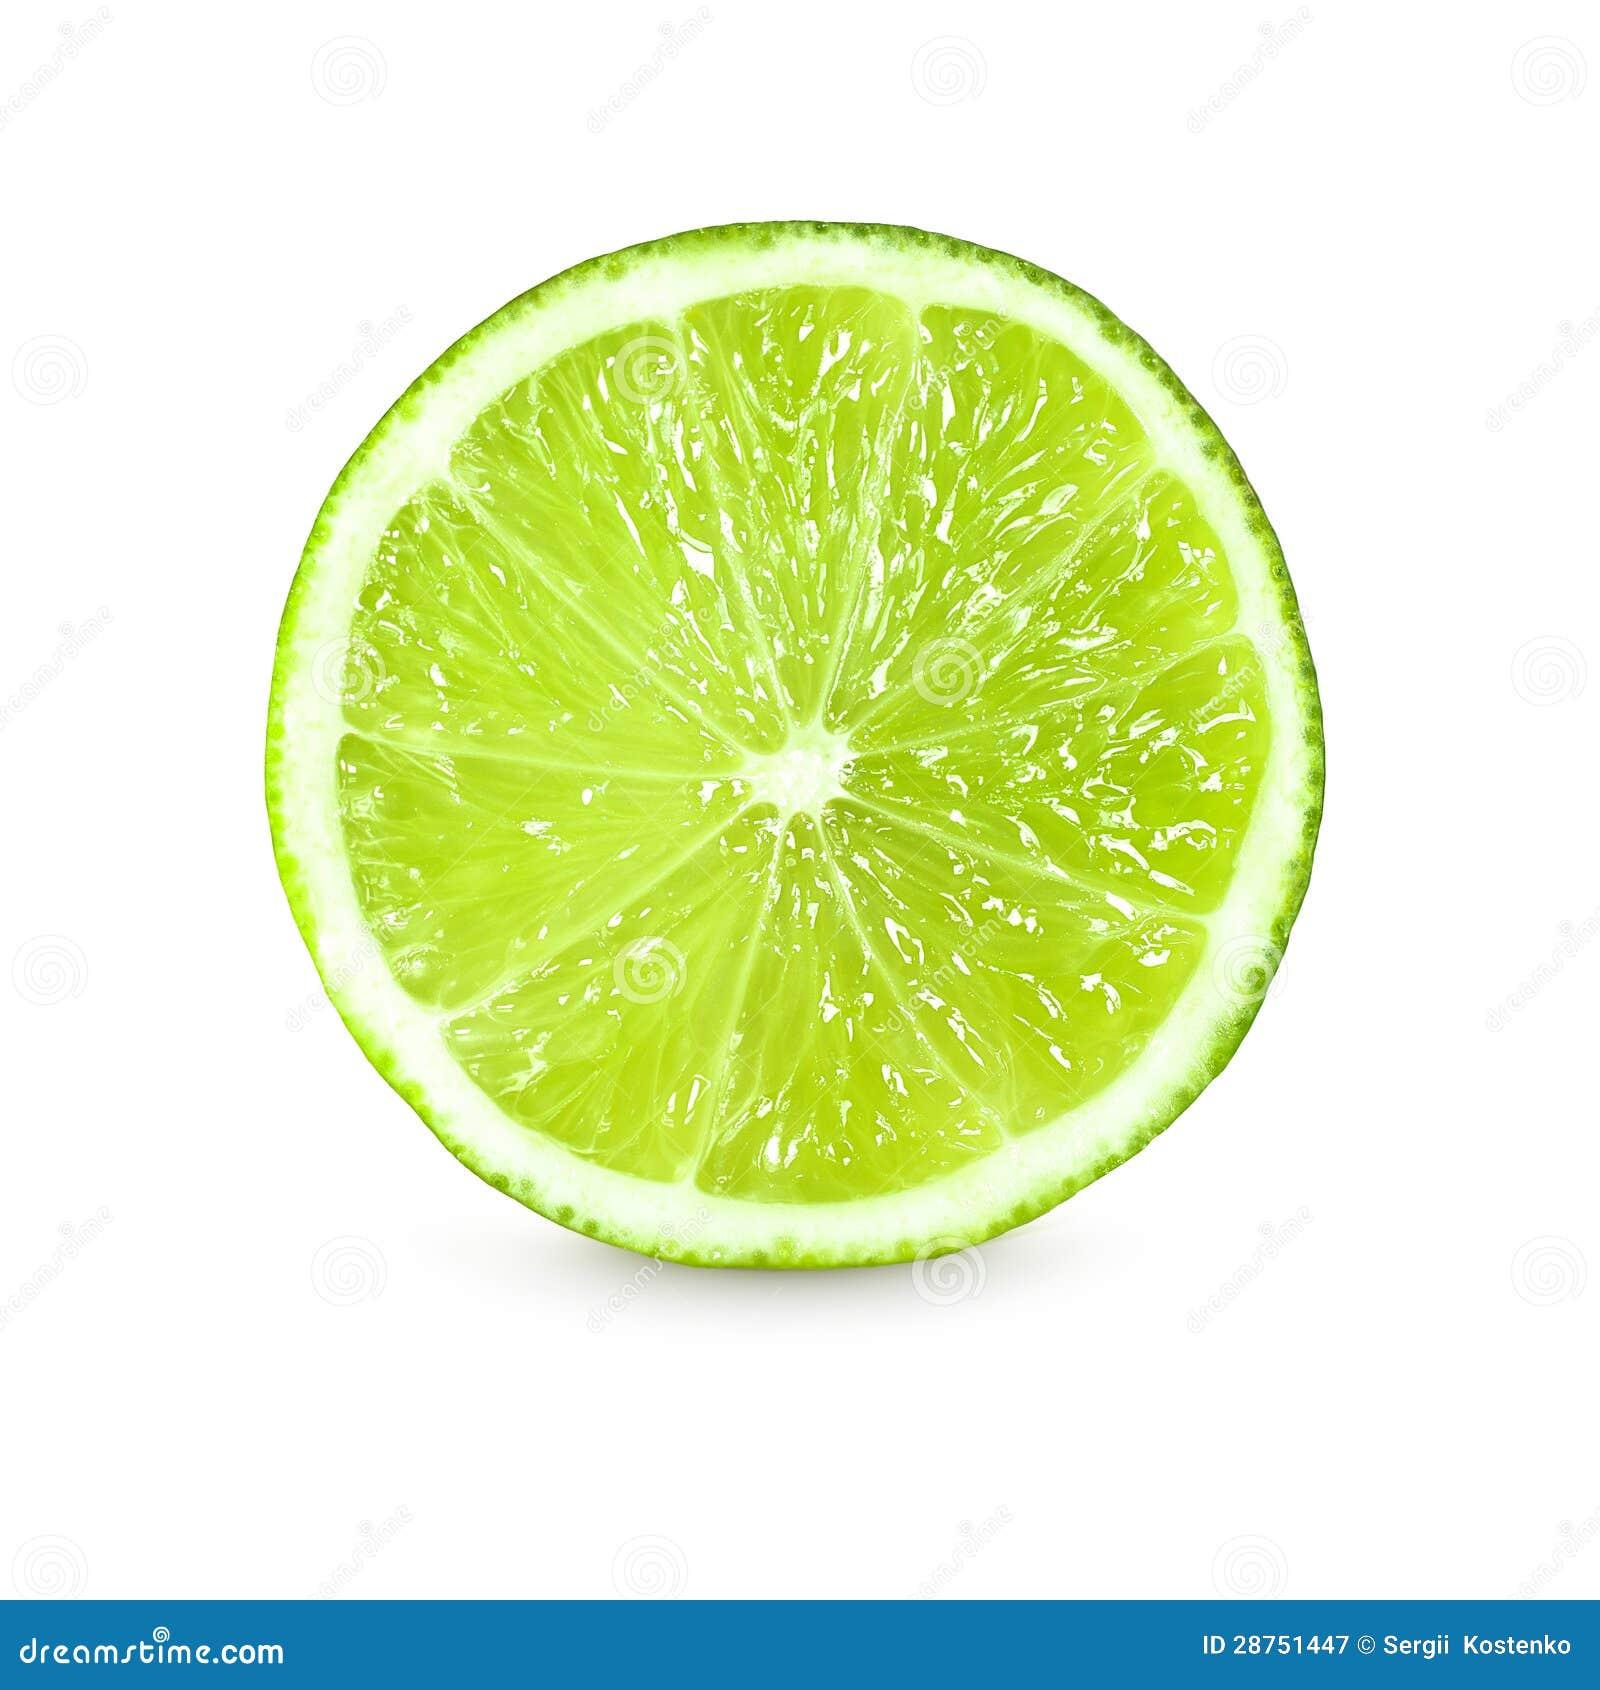 Slice Of Fresh Lime On White Background Royalty Free Stock Photography - Image: 28751447